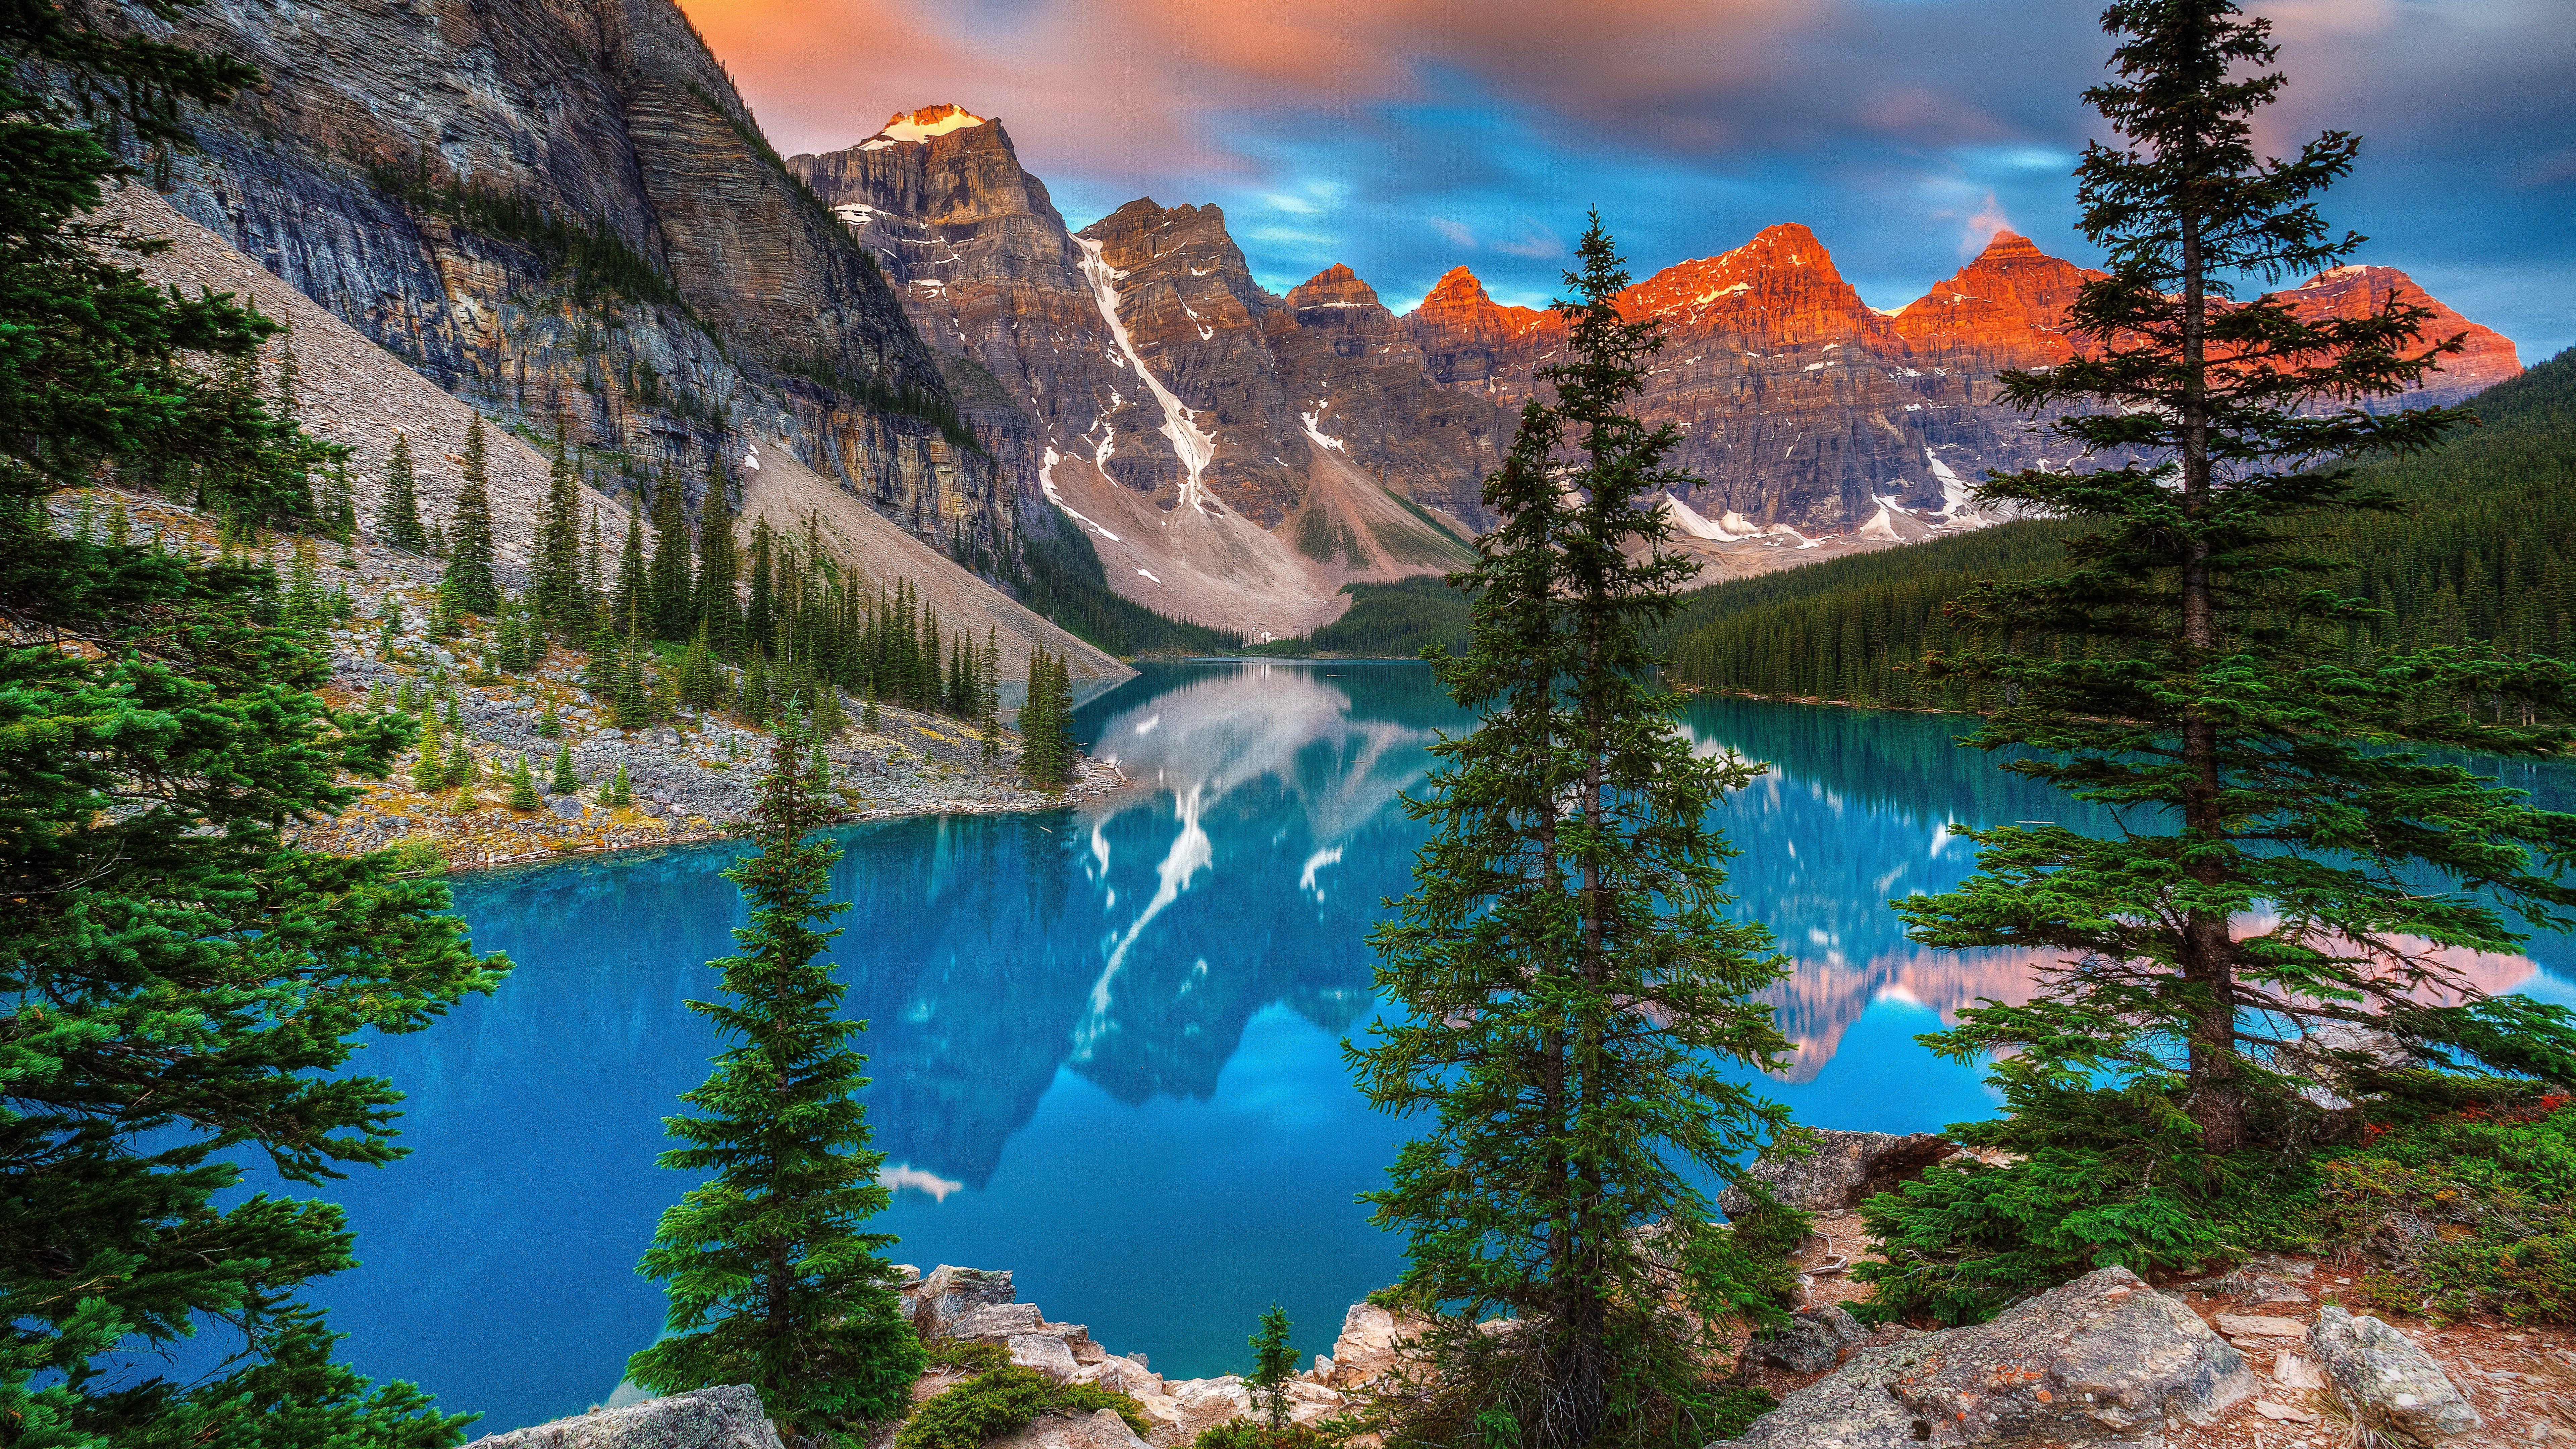 mountain blue lake 8k desktop background Banff national